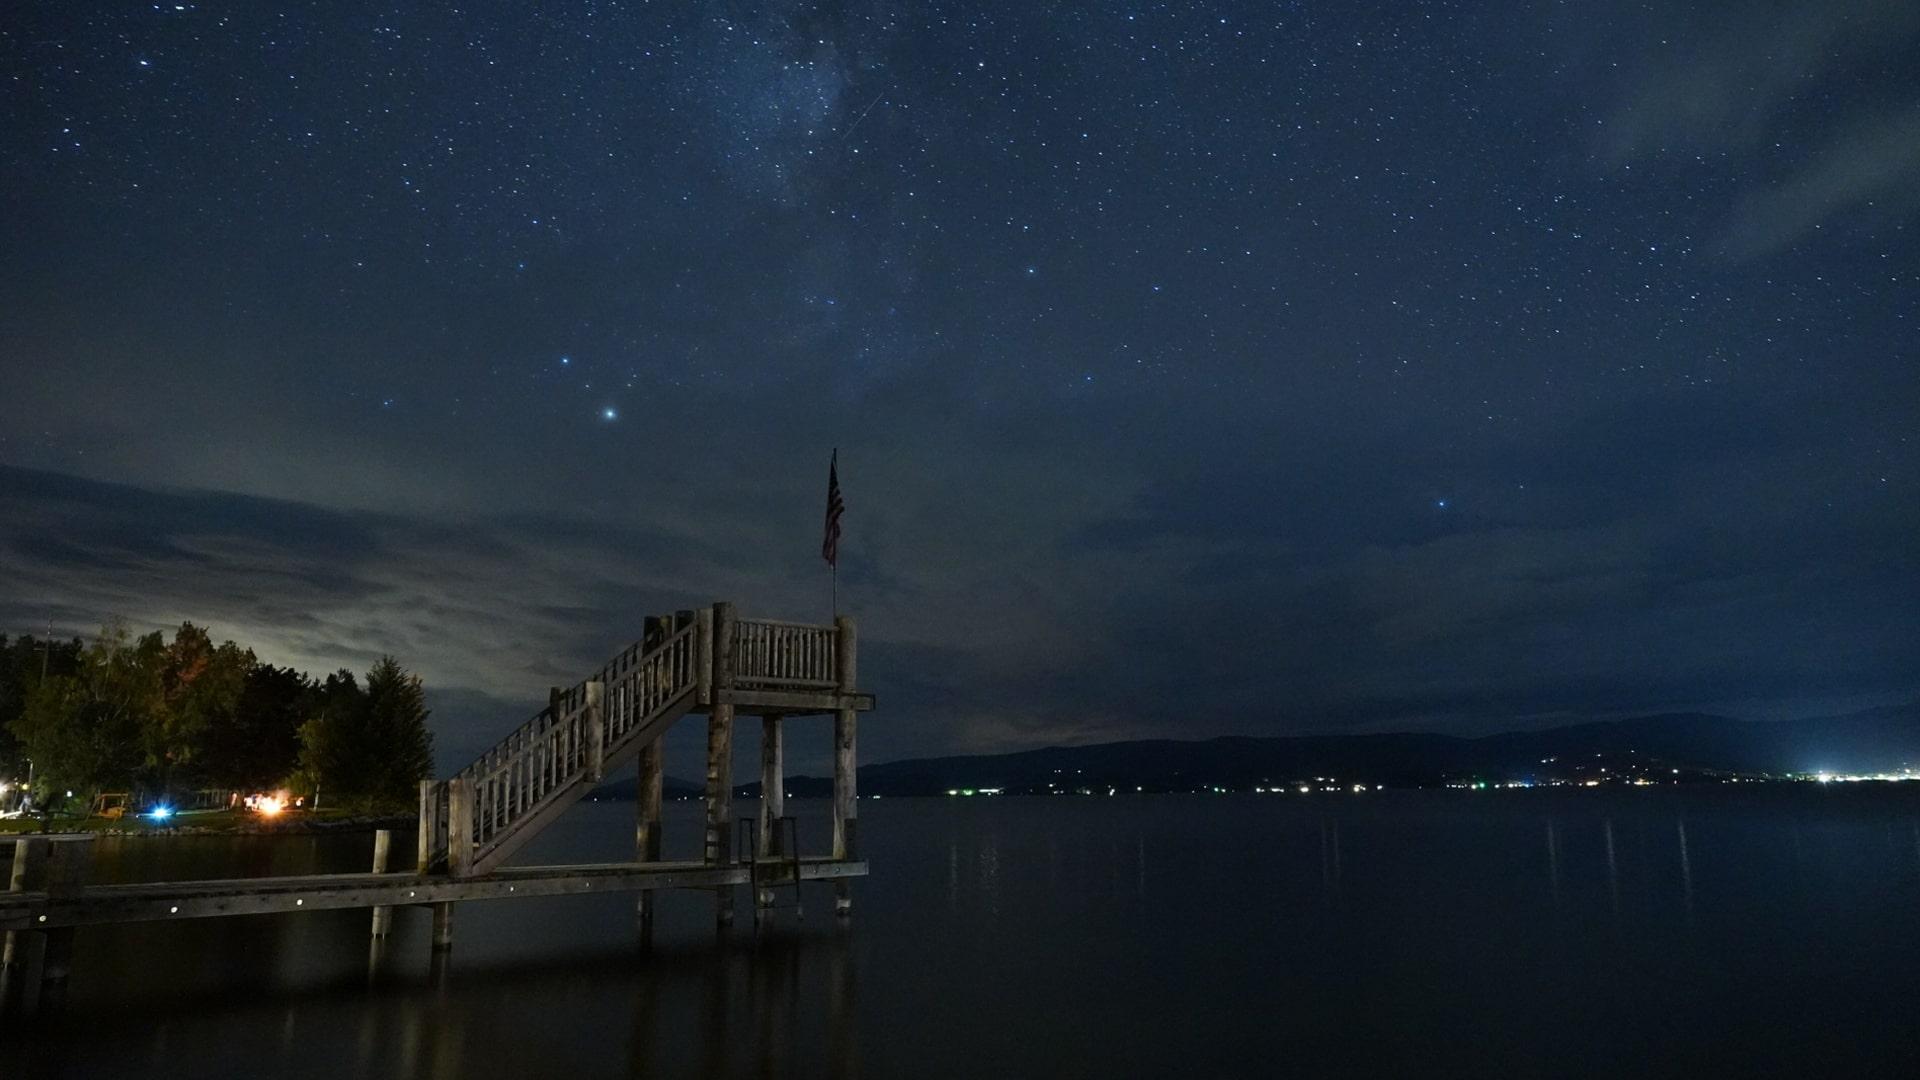 R19-Sony-Camera-Camp-2019-Flathead-Lake-Lodge-Night-Milky-Way-1920x1080.jpg